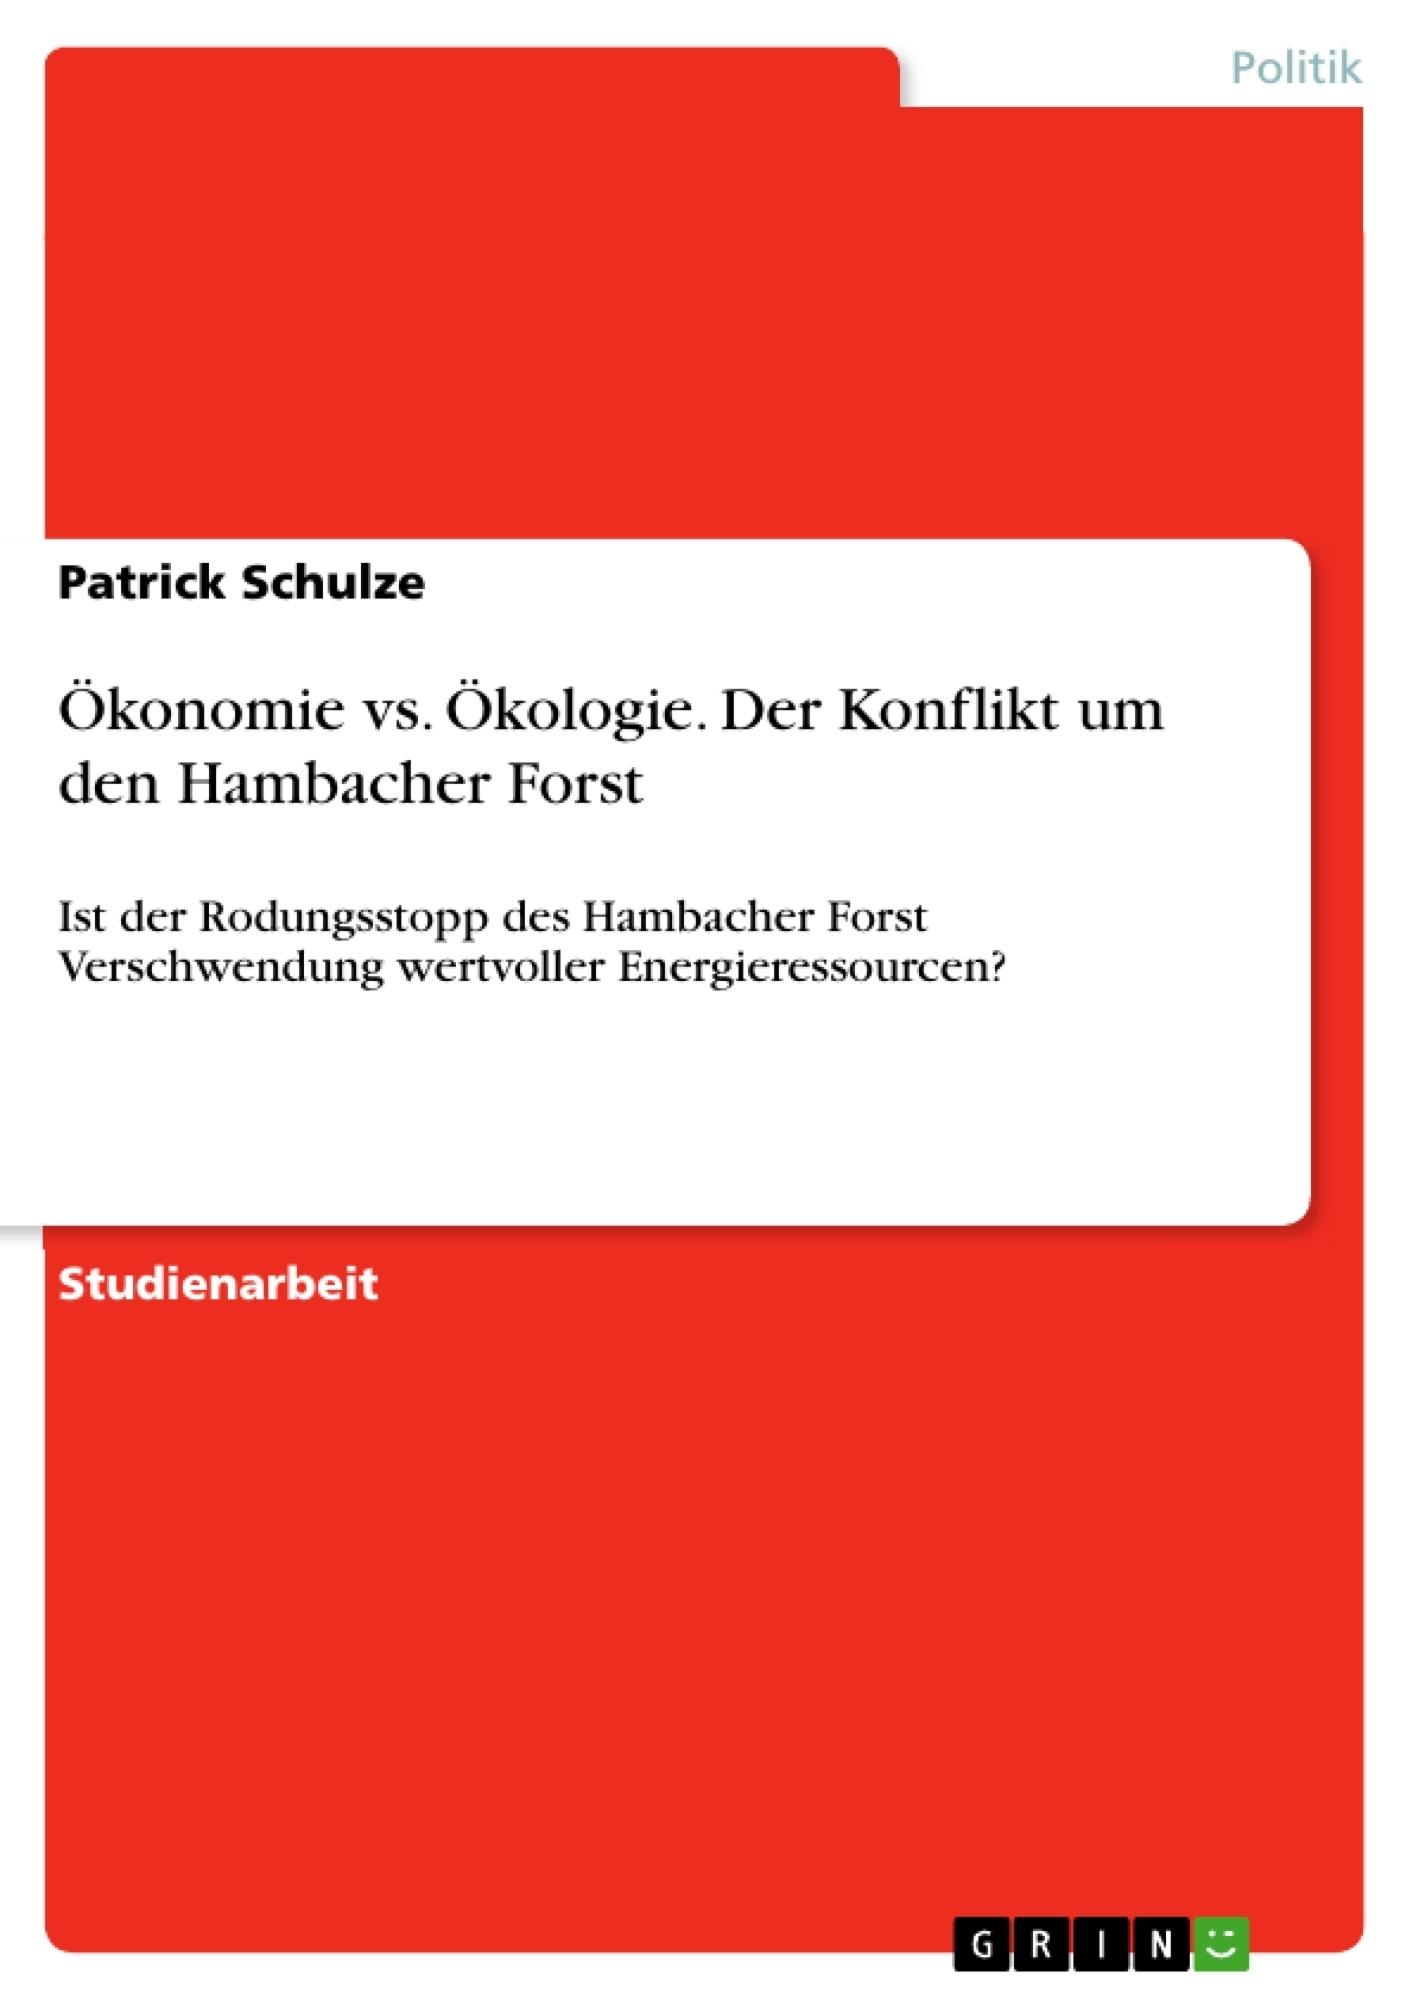 Titel: Ökonomie vs. Ökologie. Der Konflikt um den Hambacher Forst